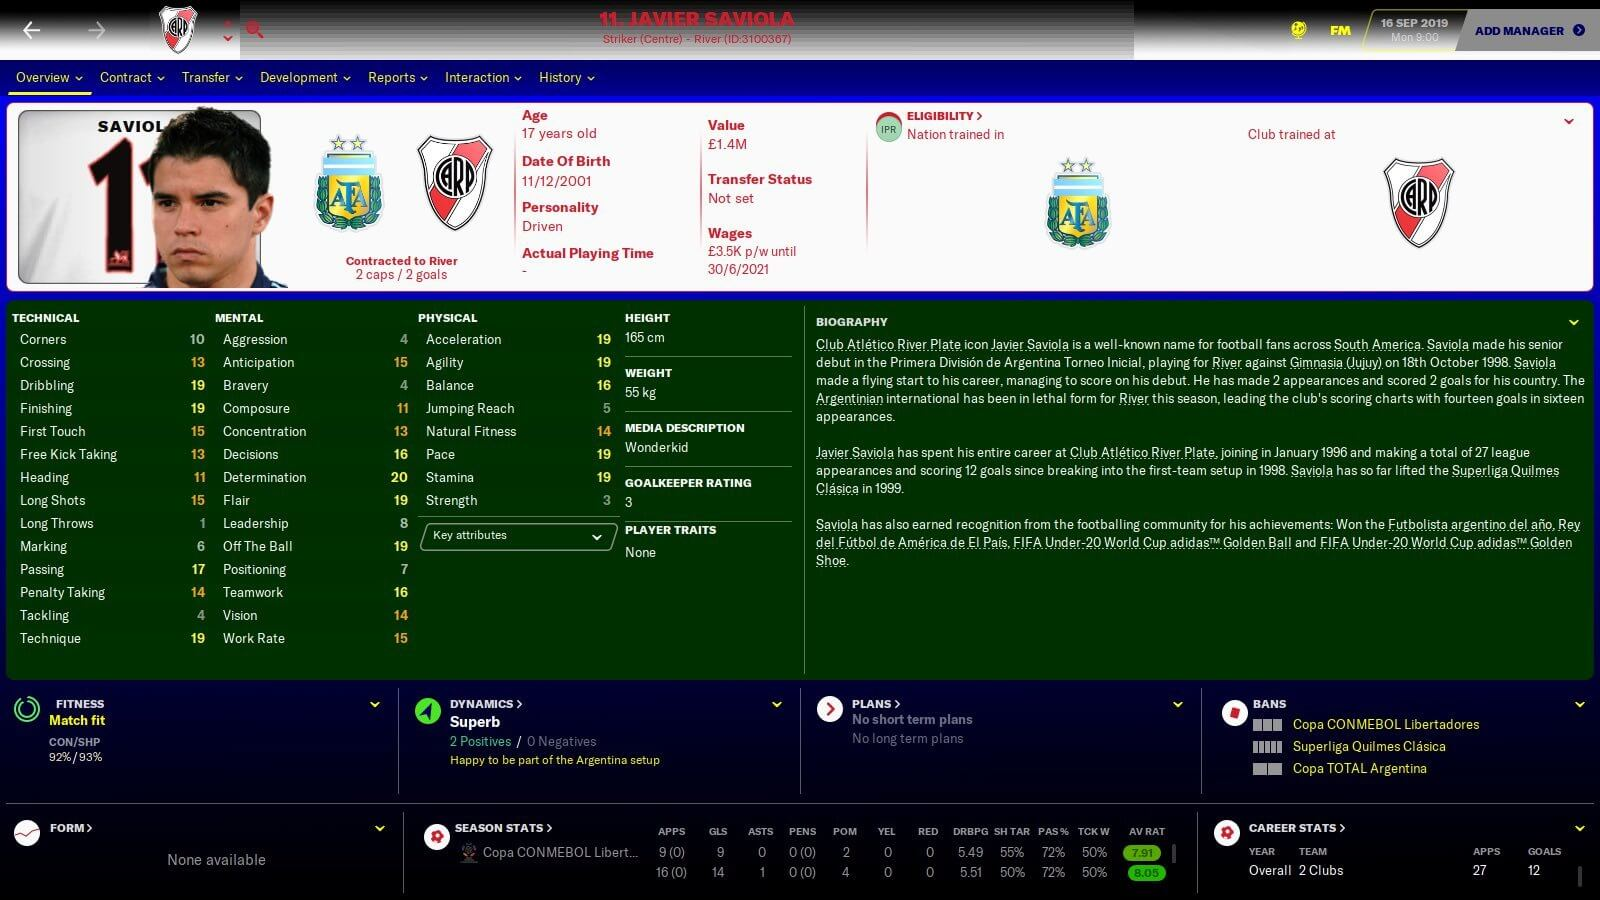 Javier Saviola player profile FM20 1999-2000 retro database